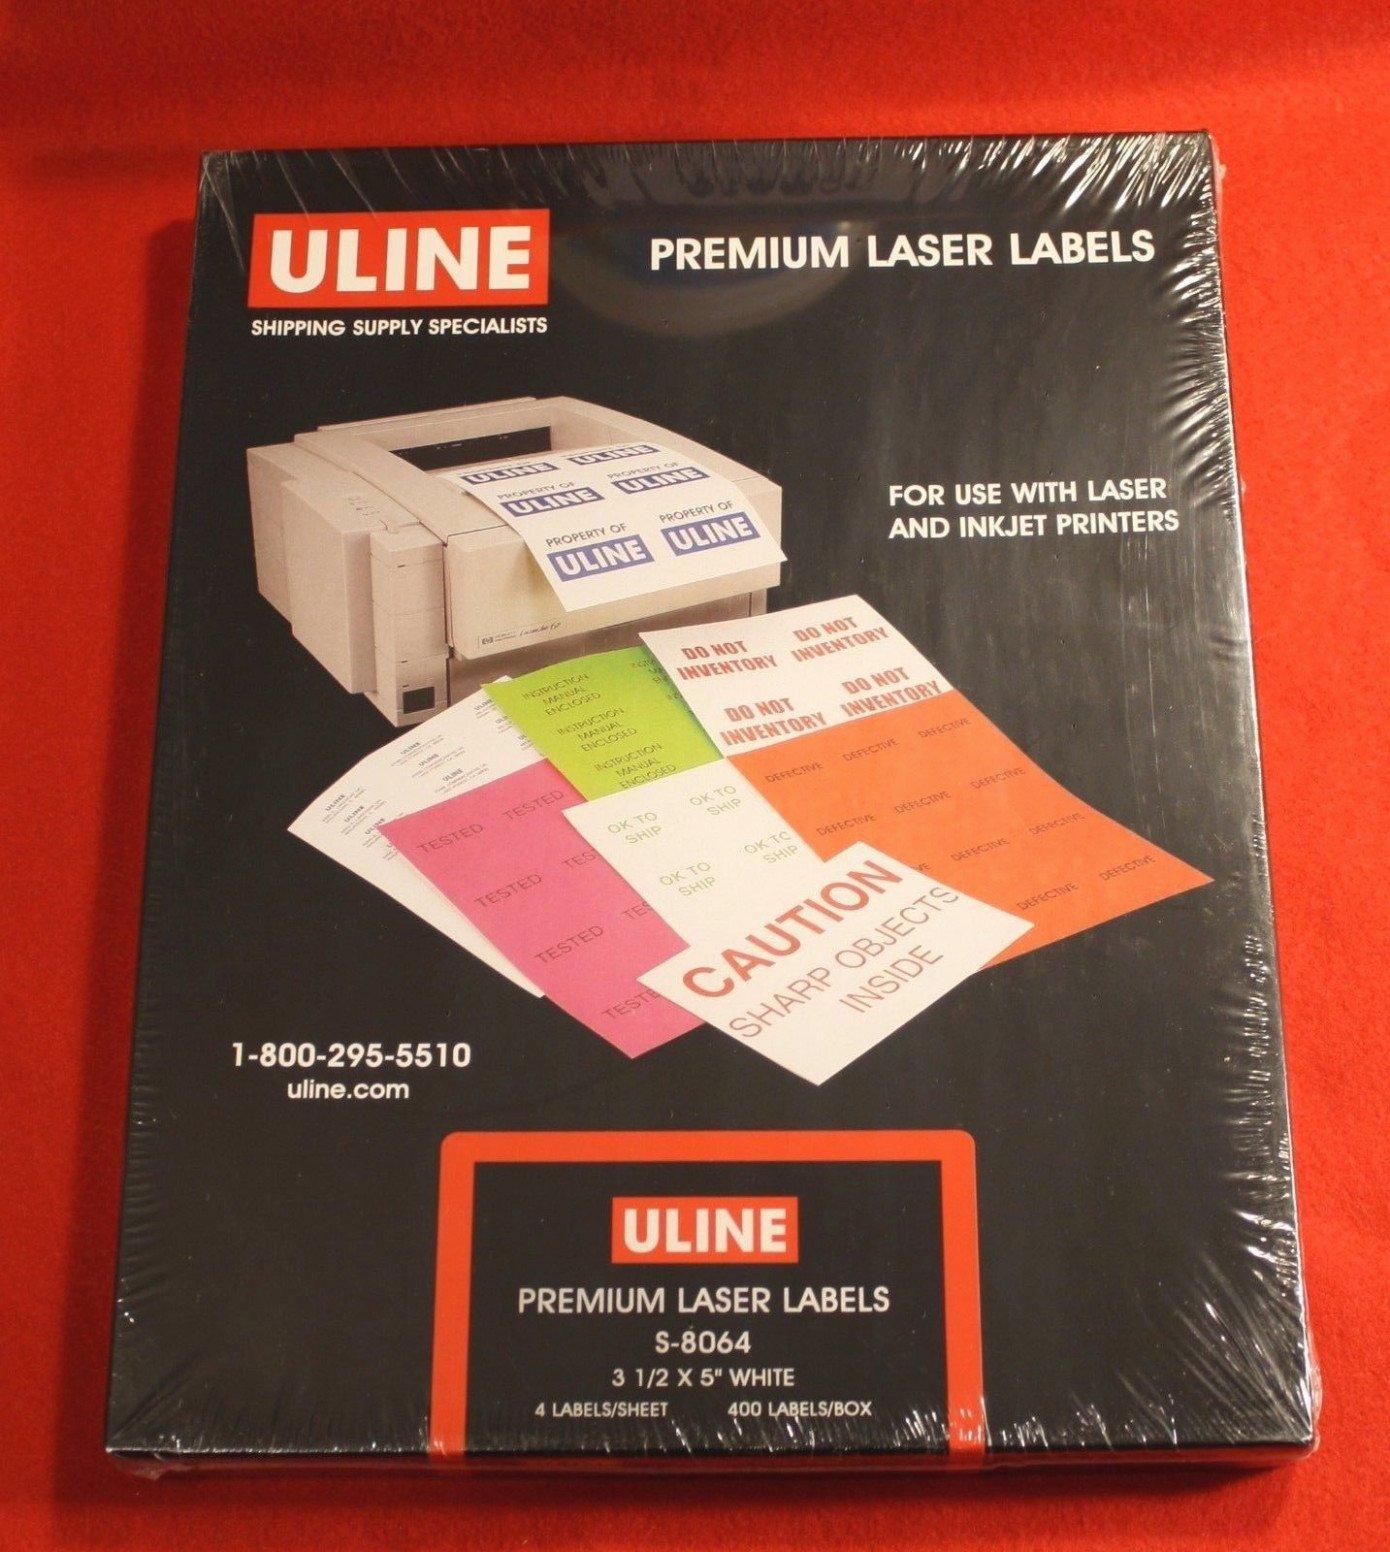 Uline Premium Laser Labels Awesome Five Ways Uline 15x15 Labels